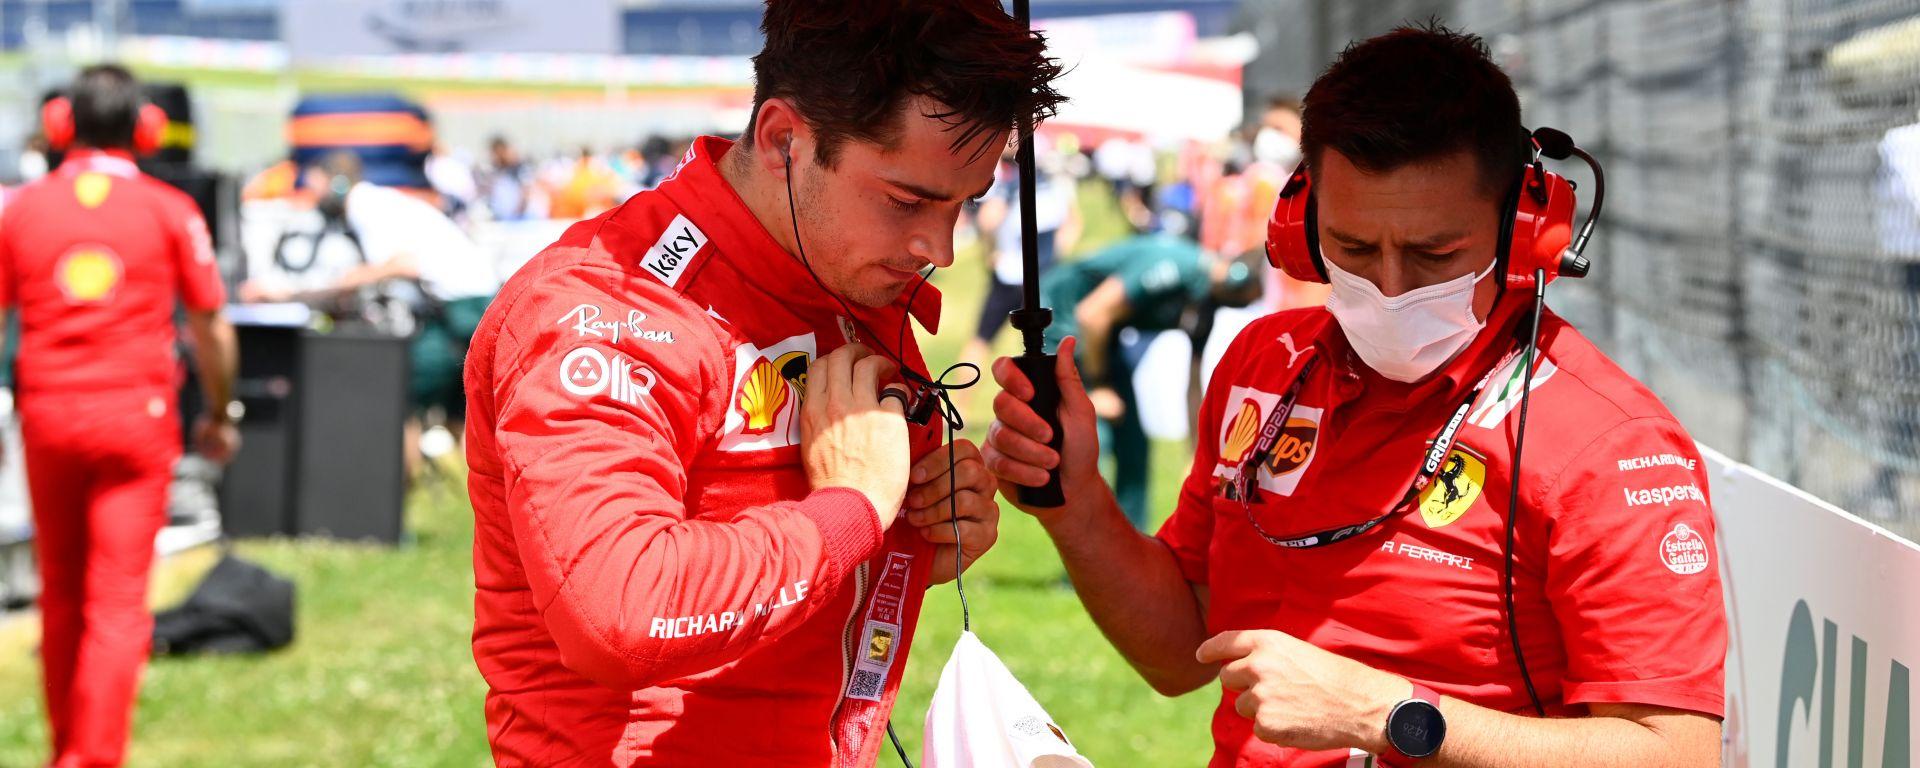 F1 GP Stiria 2021, Spielberg: Charles Leclerc (Scuderia Ferrari)